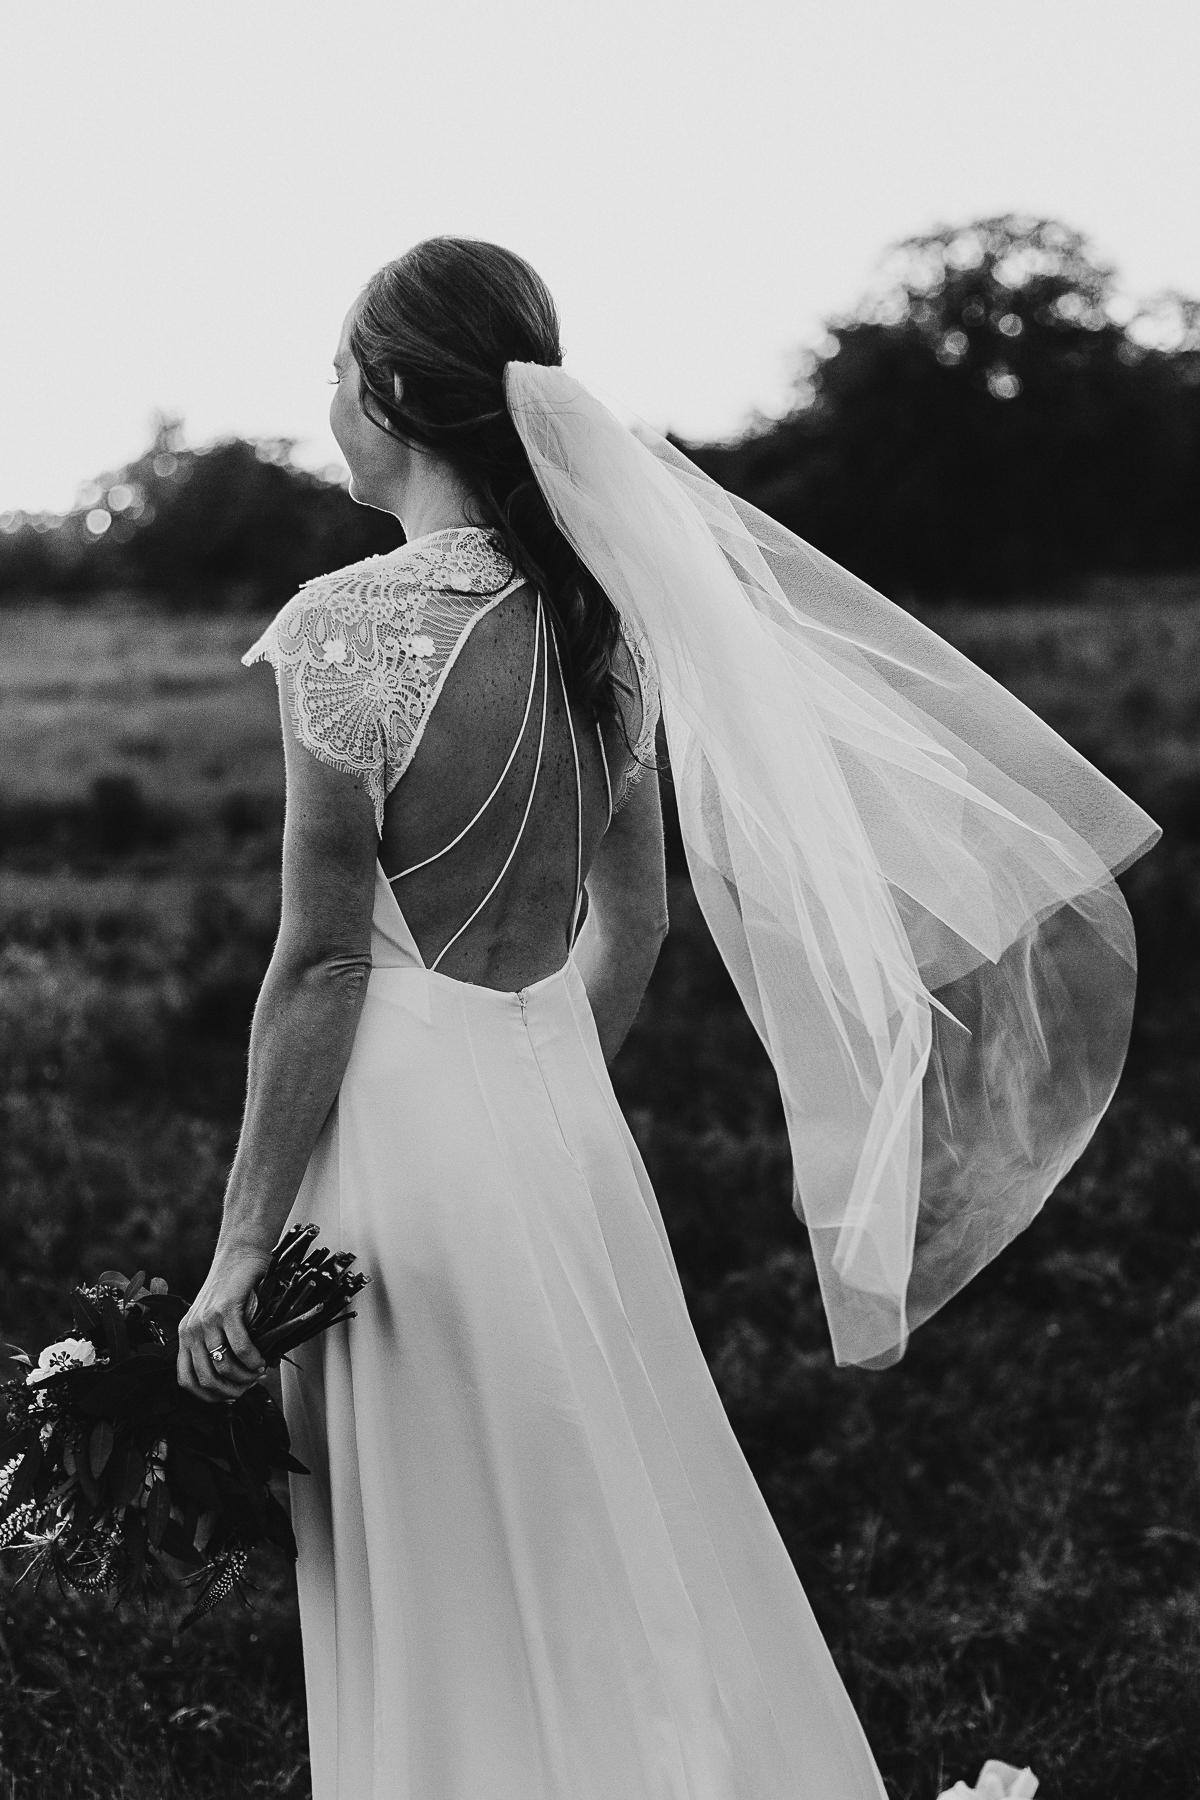 Austin Wedding Photographer Lady Bird Johnson Wildflower Center Wedding 13.jpg